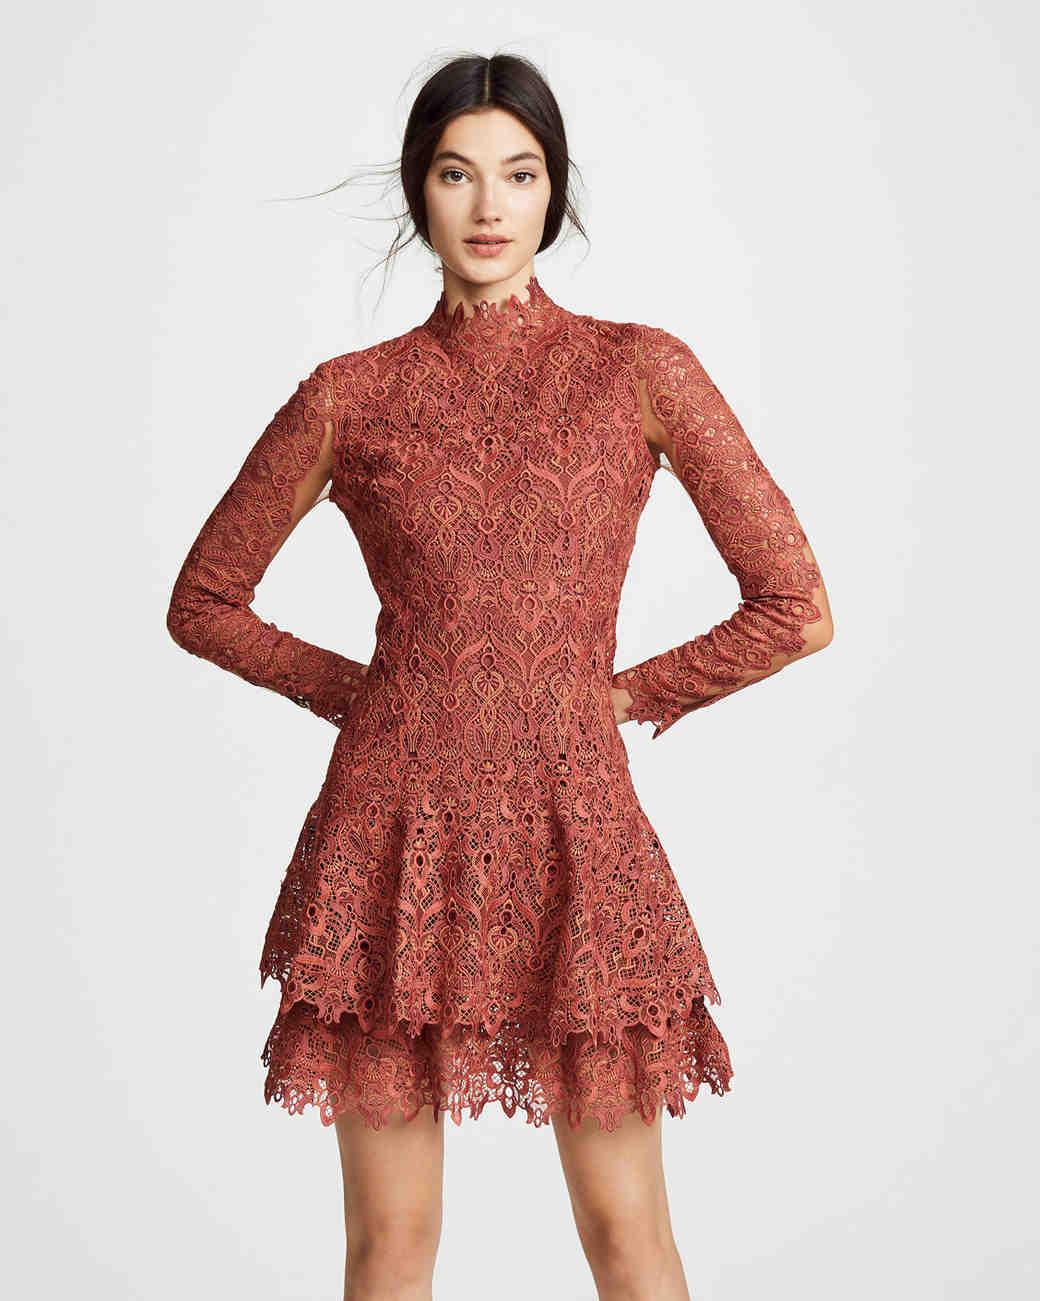 ba339367f737 Wedding Guest Dress